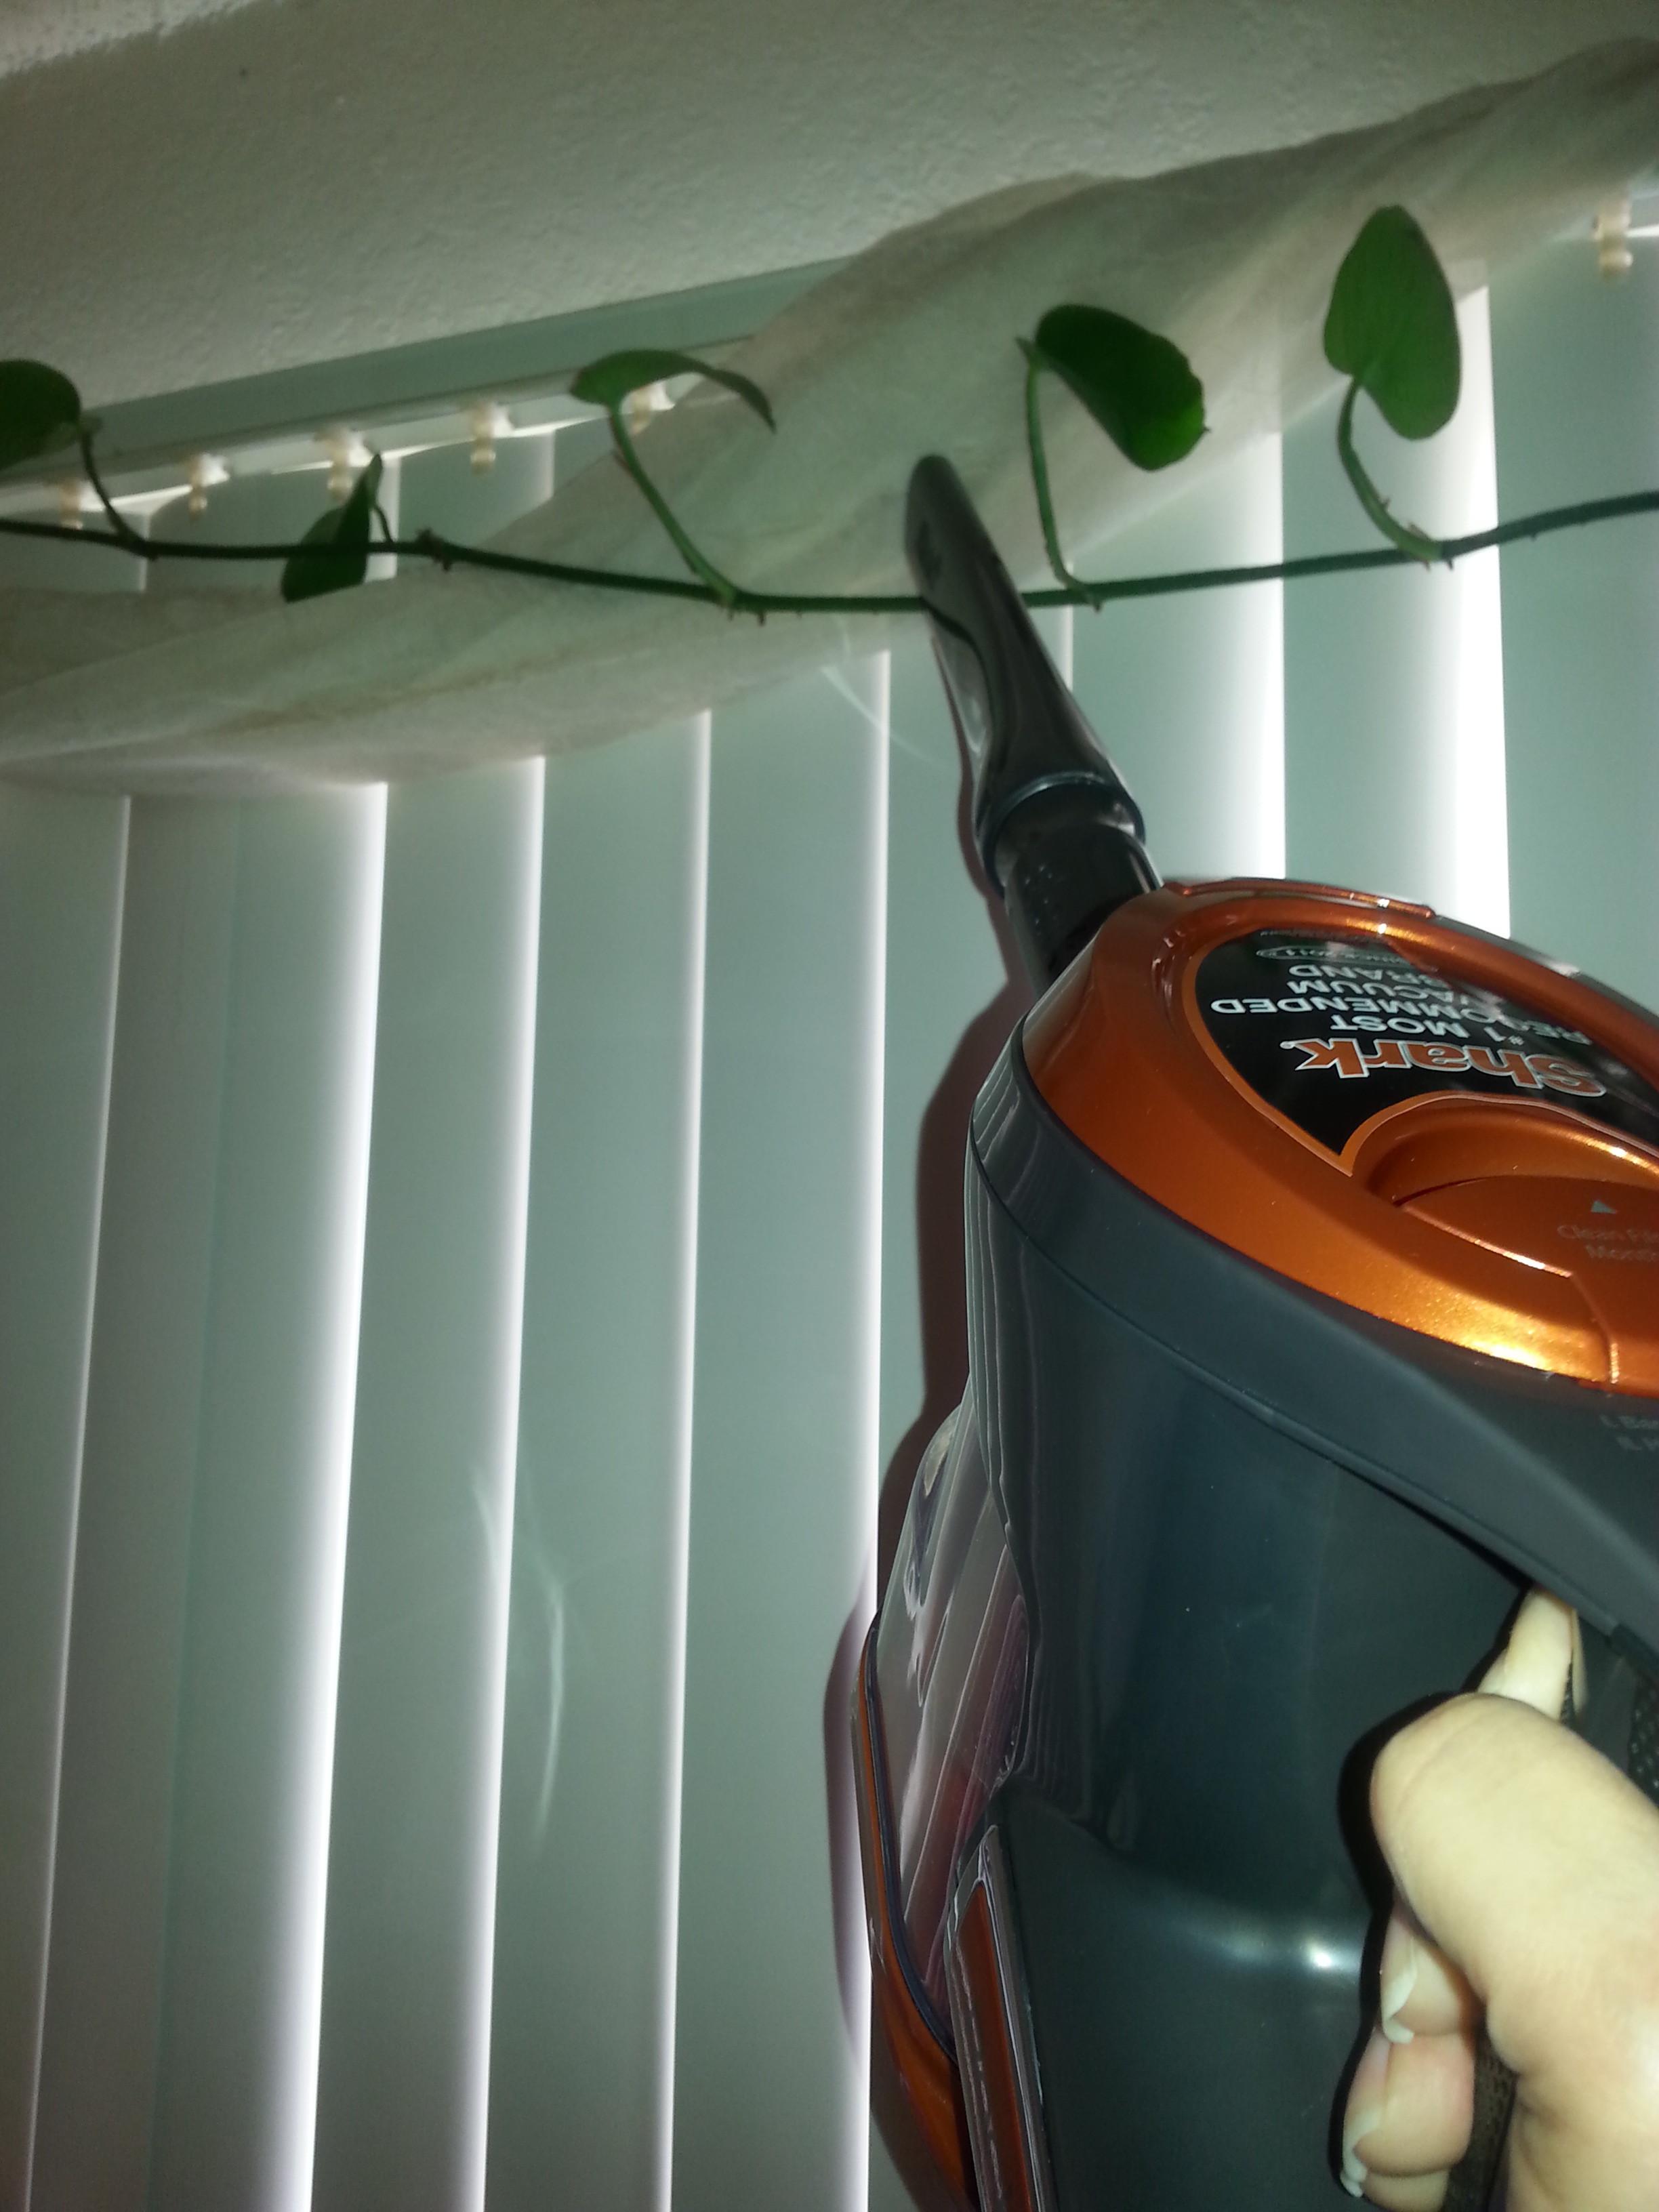 Shark Rocket Ultralight Upright Review The Easy Handling